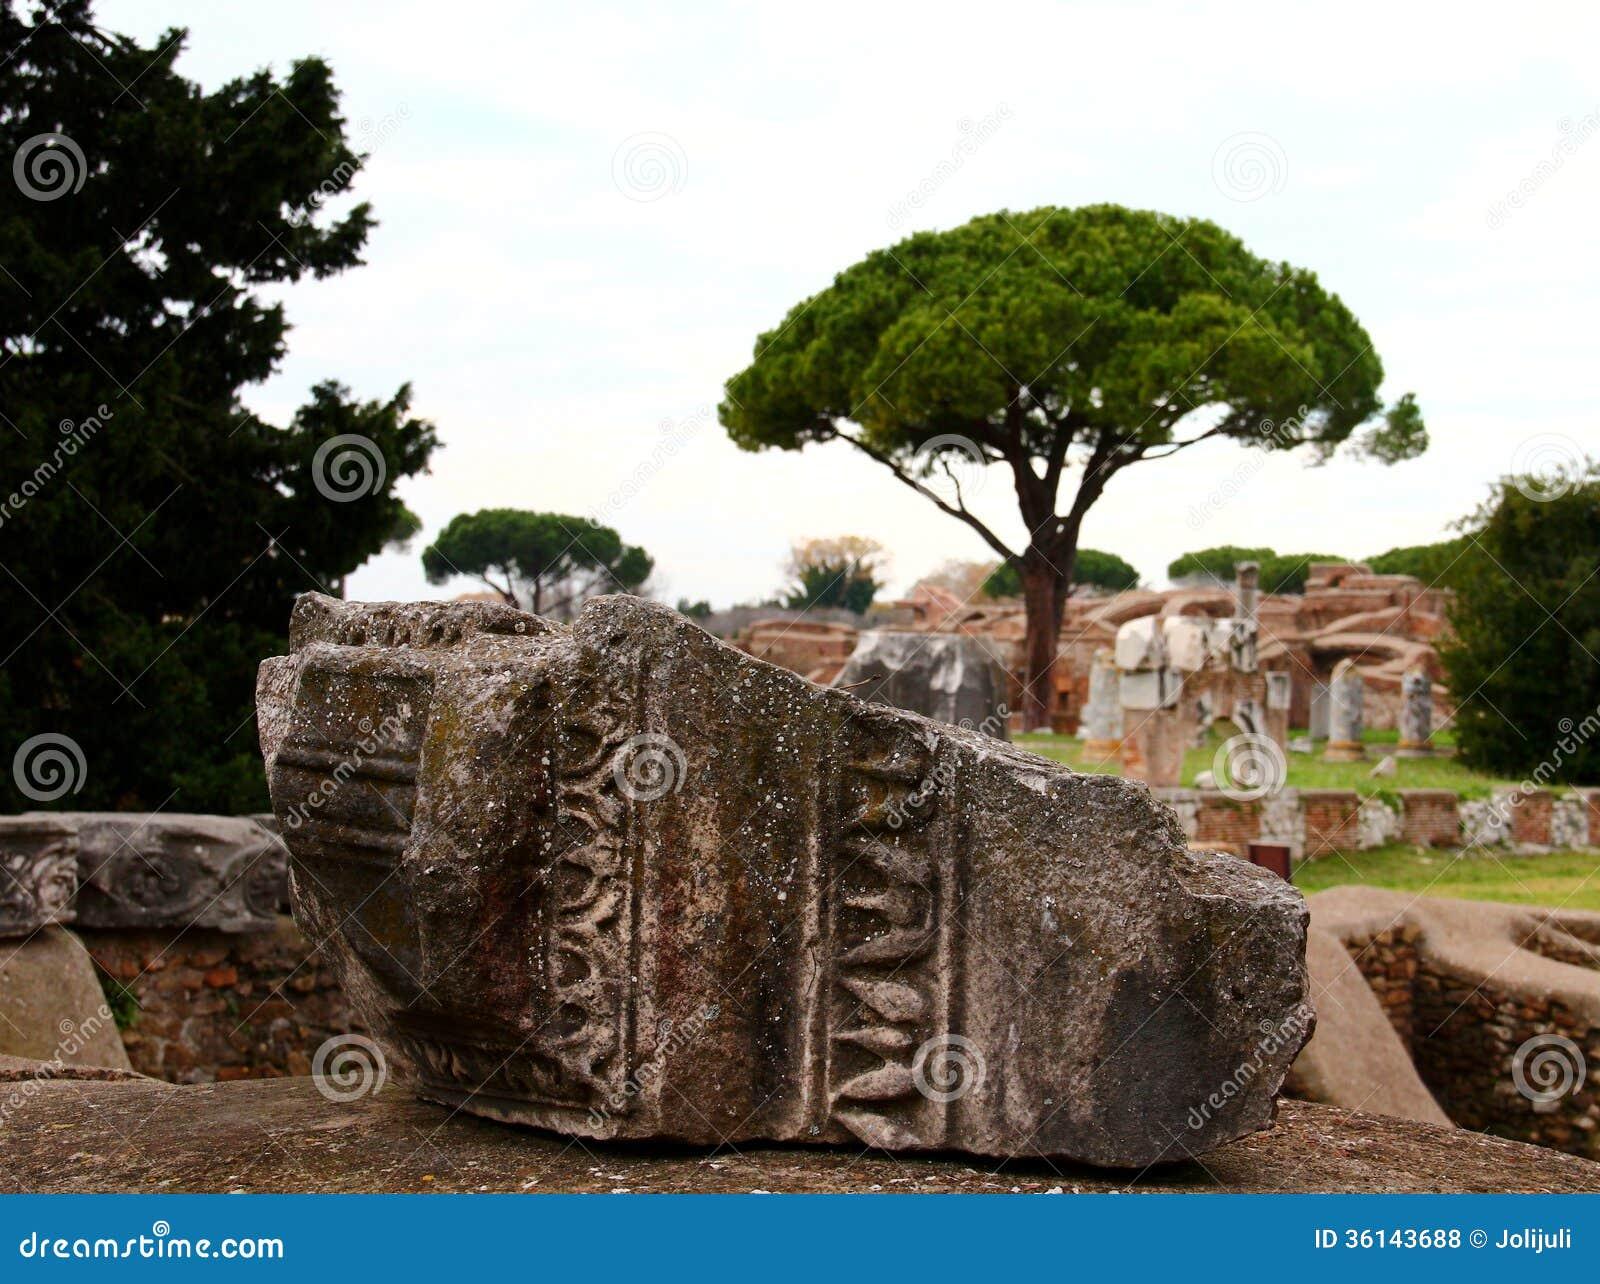 Ostia antica ruins royalty free stock photos image 36143688 for Mr arredamenti ostia antica